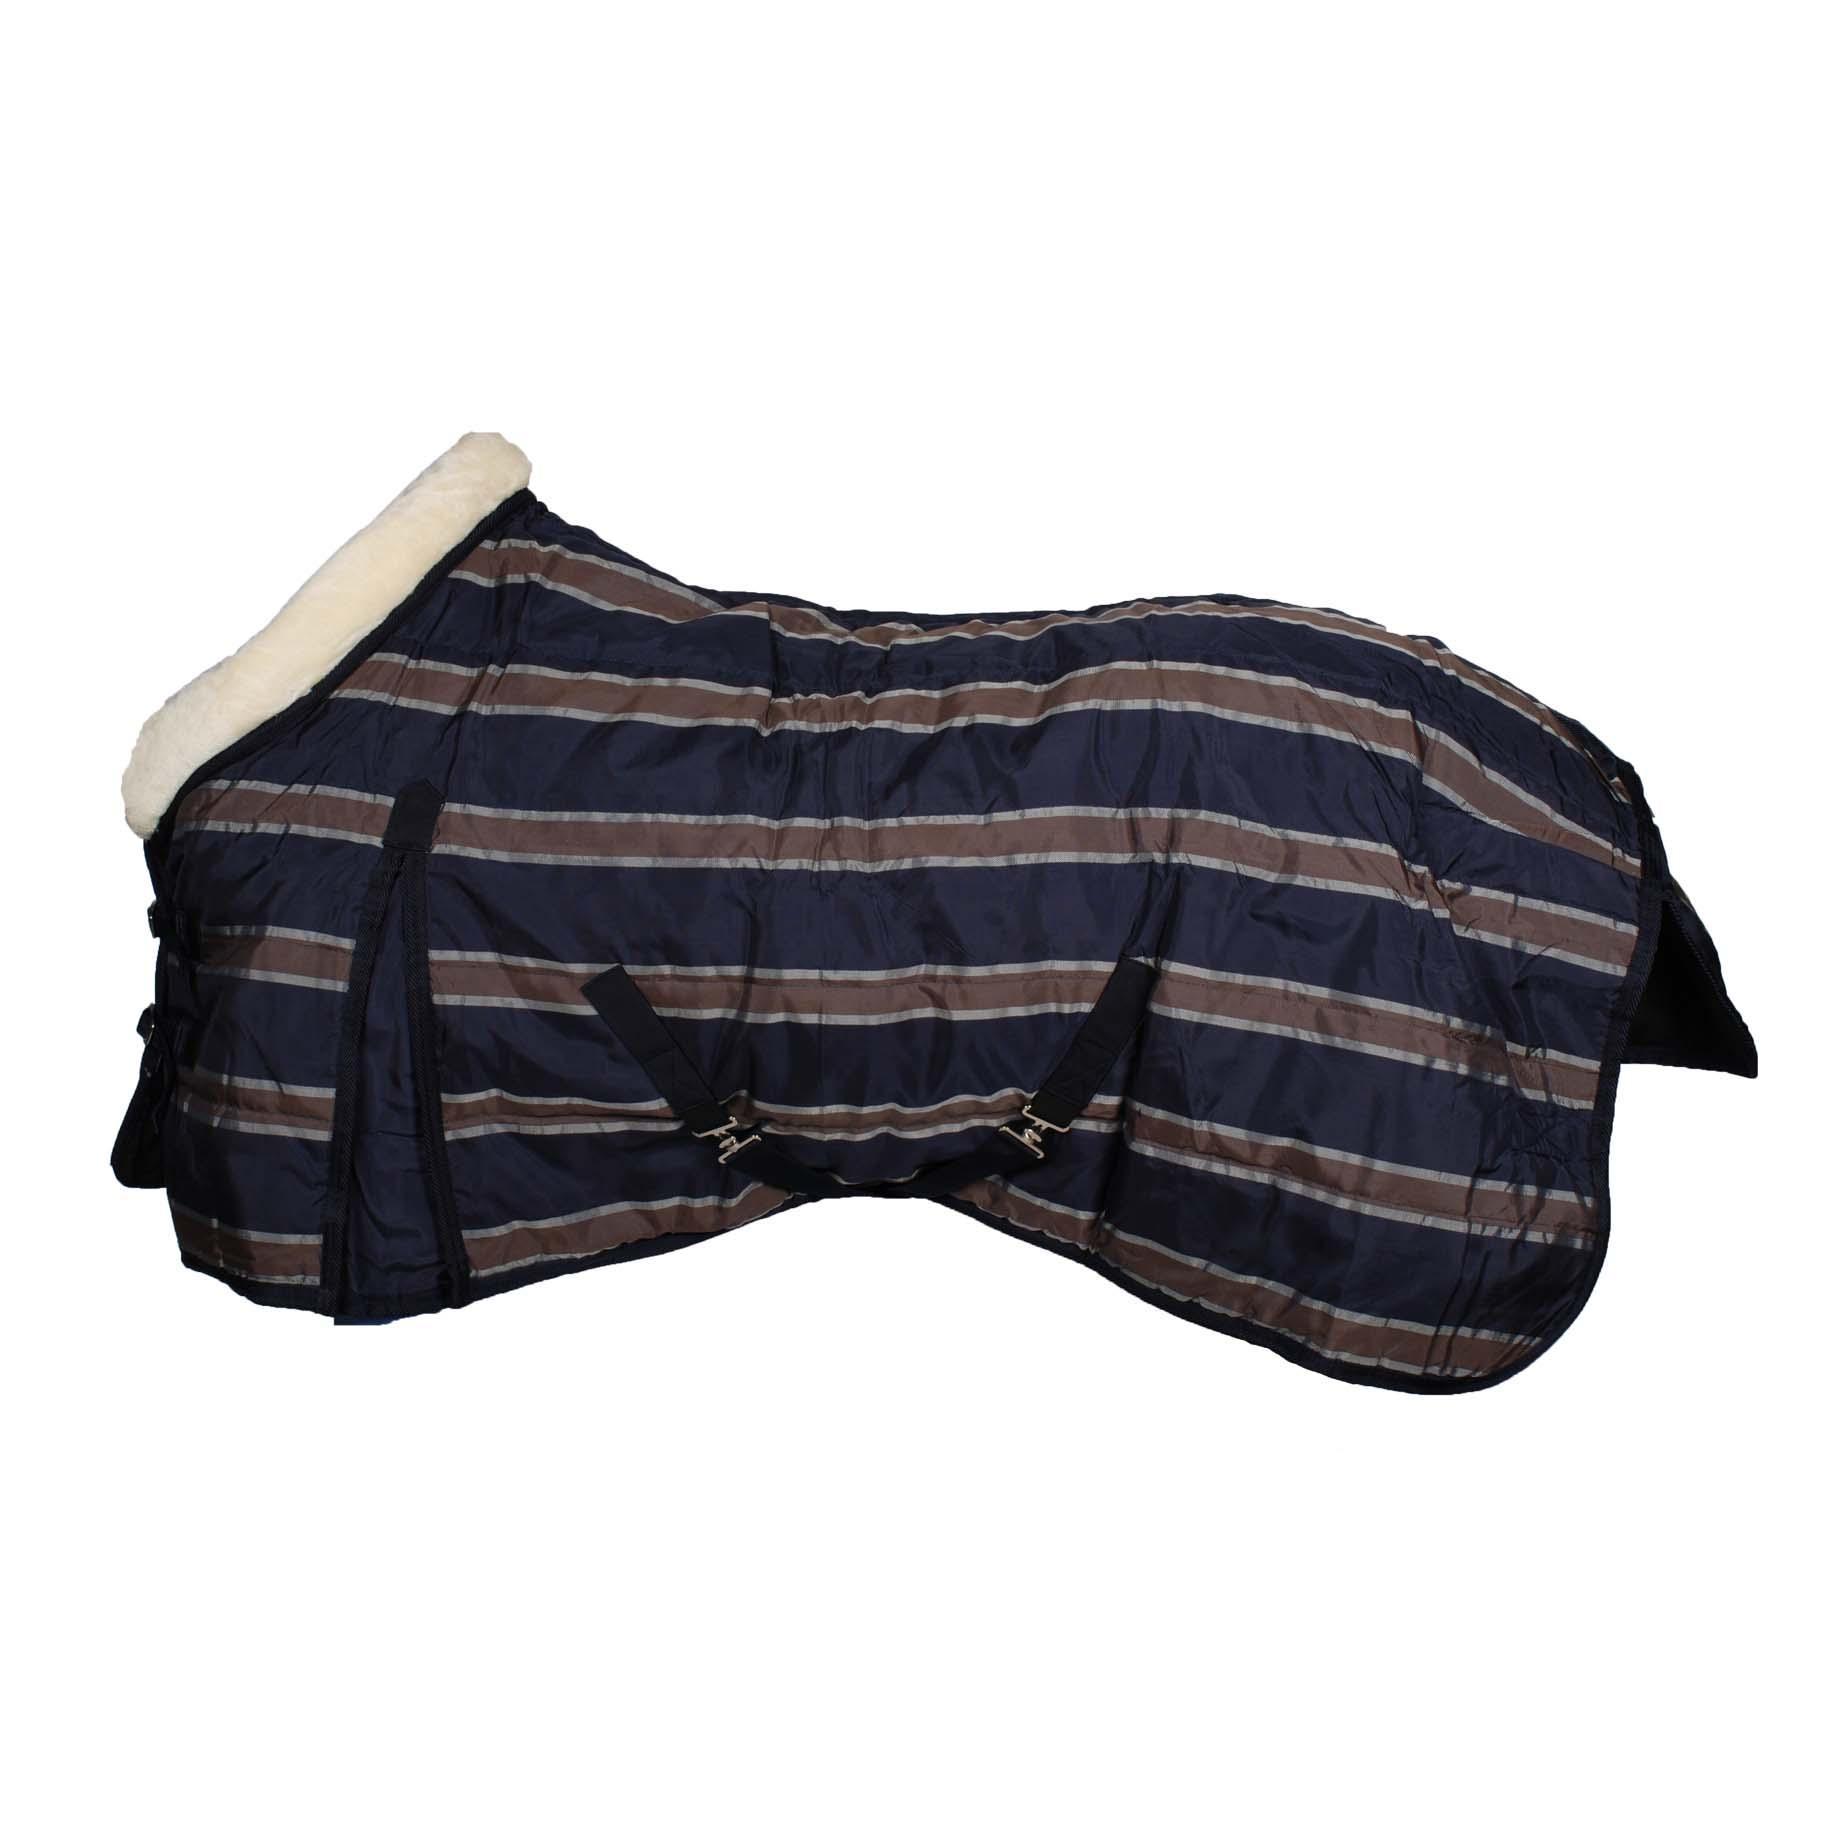 Pagony Stripe 220 staldeken donkerblauw maat:175